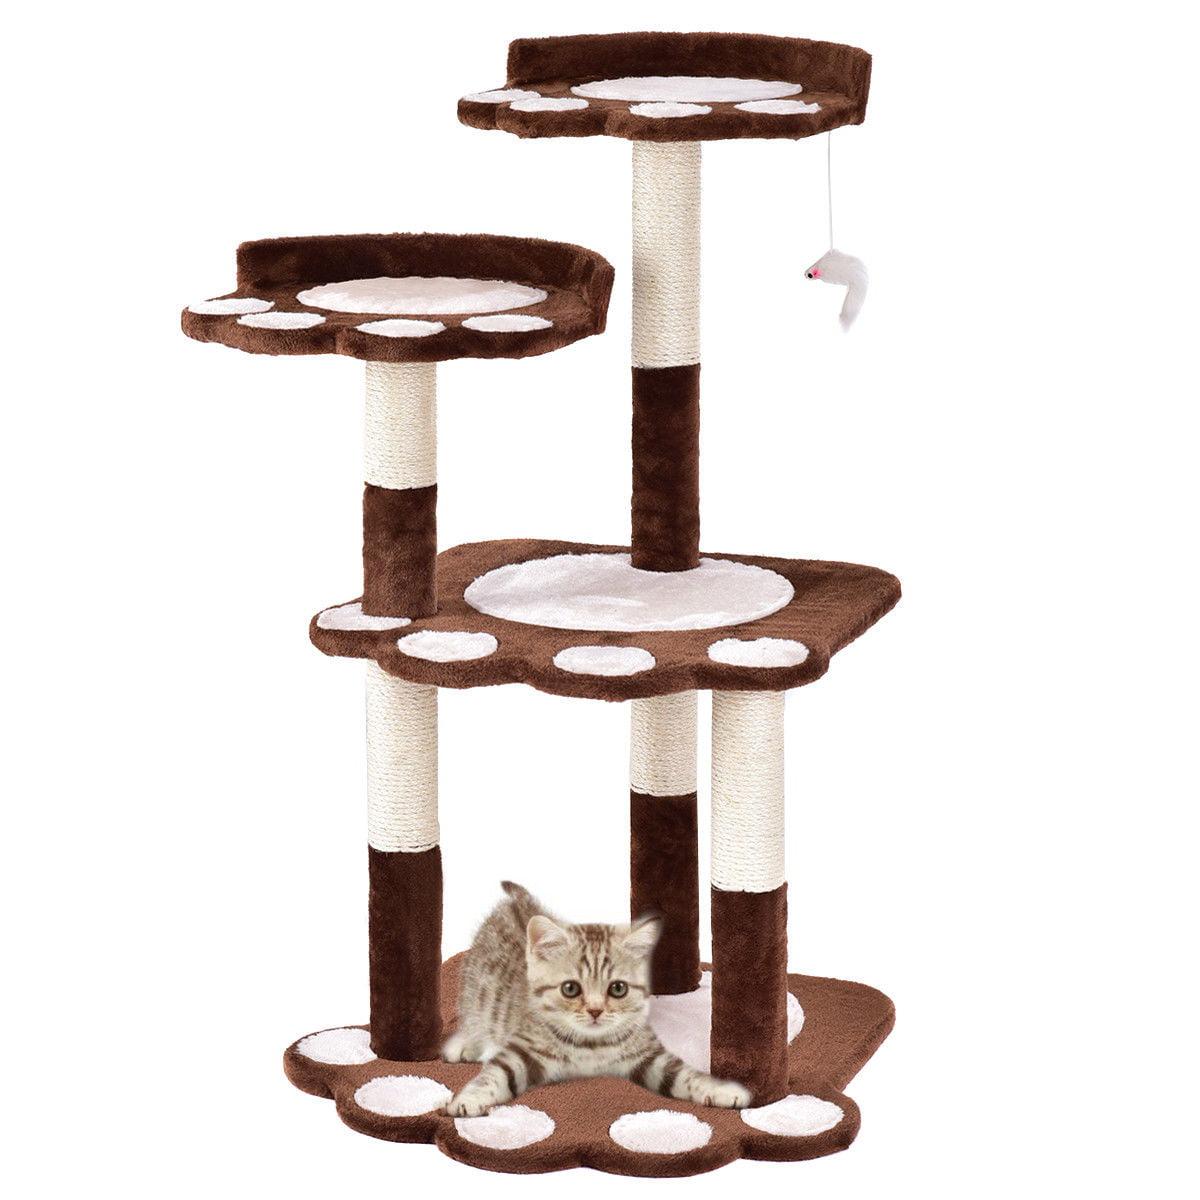 Gymax 42'' Cat Tree Kitten Pet Furniture Multi-level Climb Scratching Posts Paw Brown - image 6 de 10